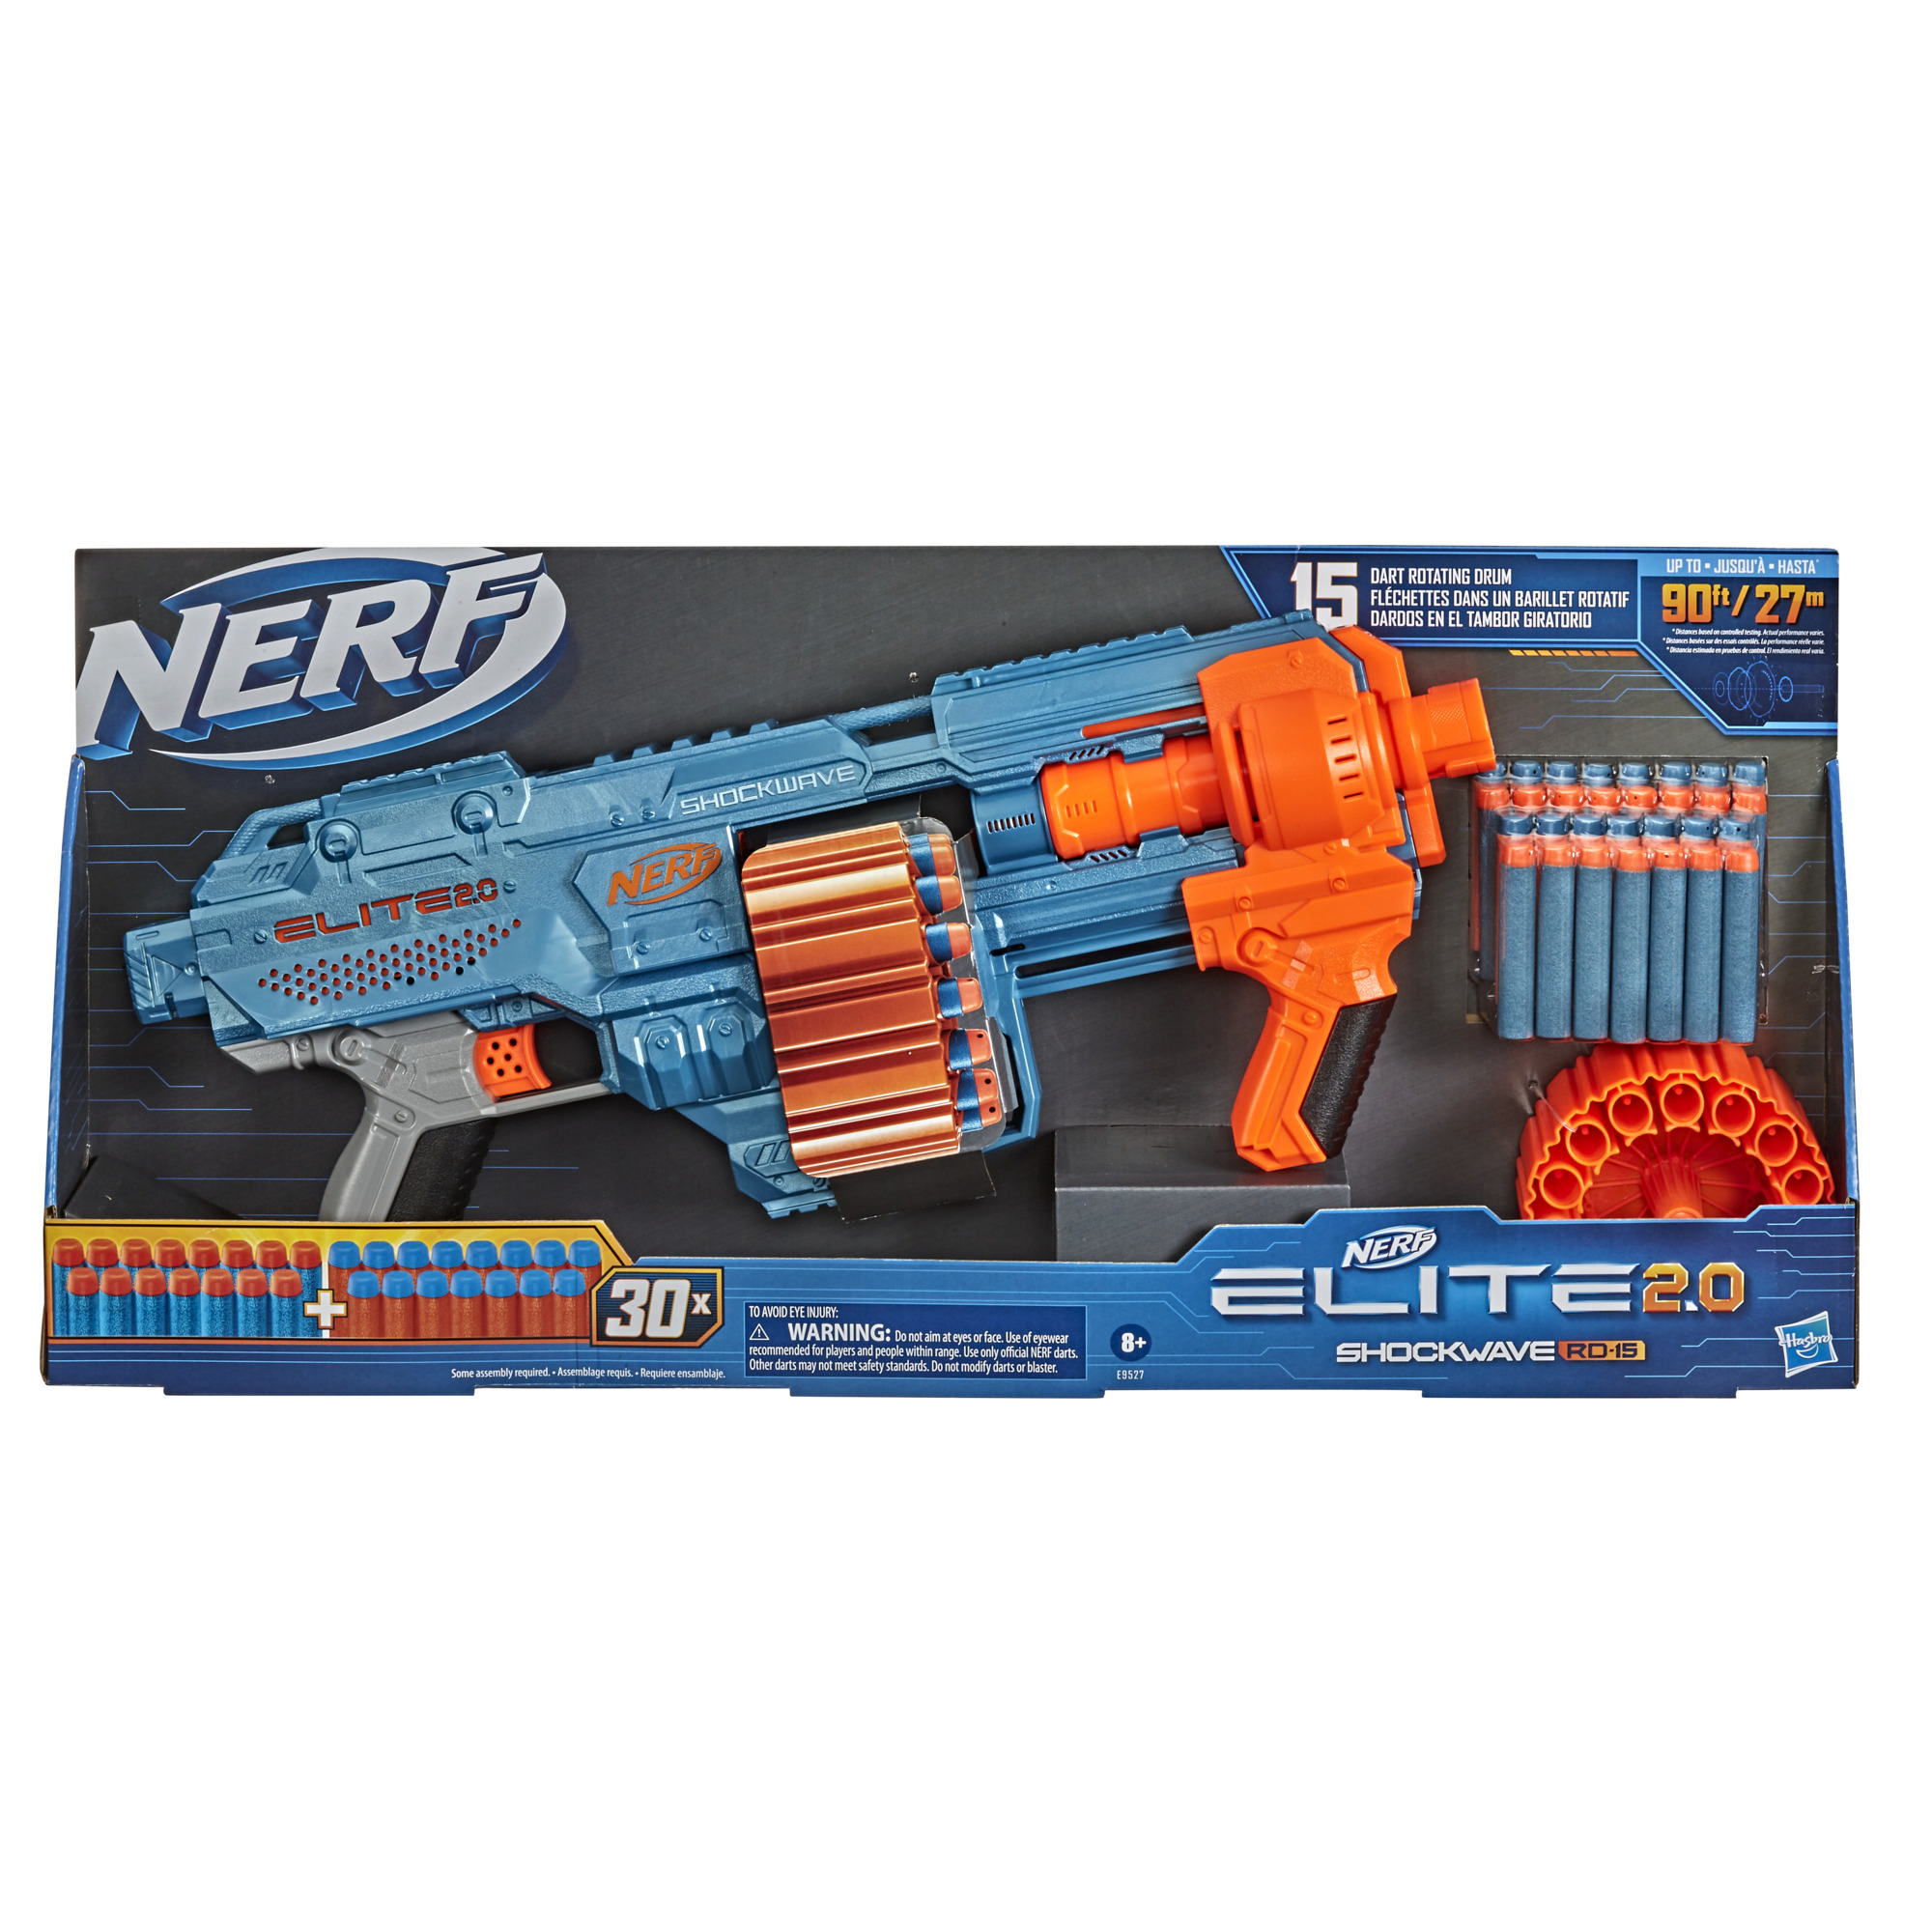 Nerf Elite 2.0 Shockwave RD-15 Blaster, 30 Nerf Darts, 15-Dart Rotating Drum, Customizing Capabilities